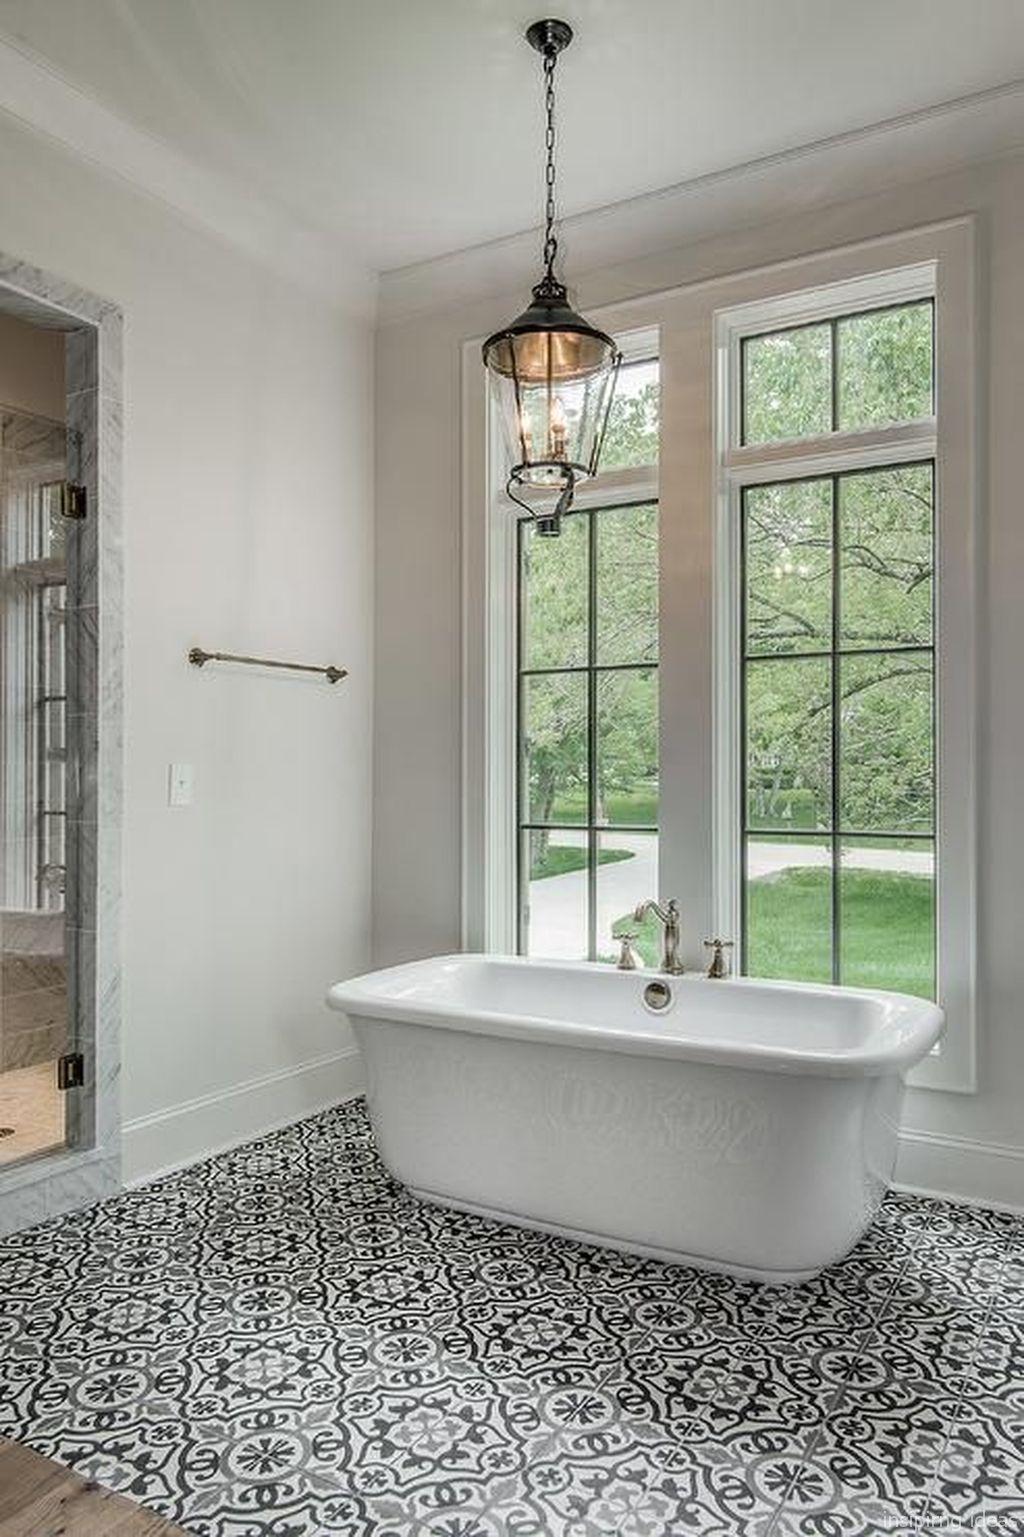 67 Incredible Modern Farmhouse Bathroom Tile Ideas Home with proportions 1024 X 1537